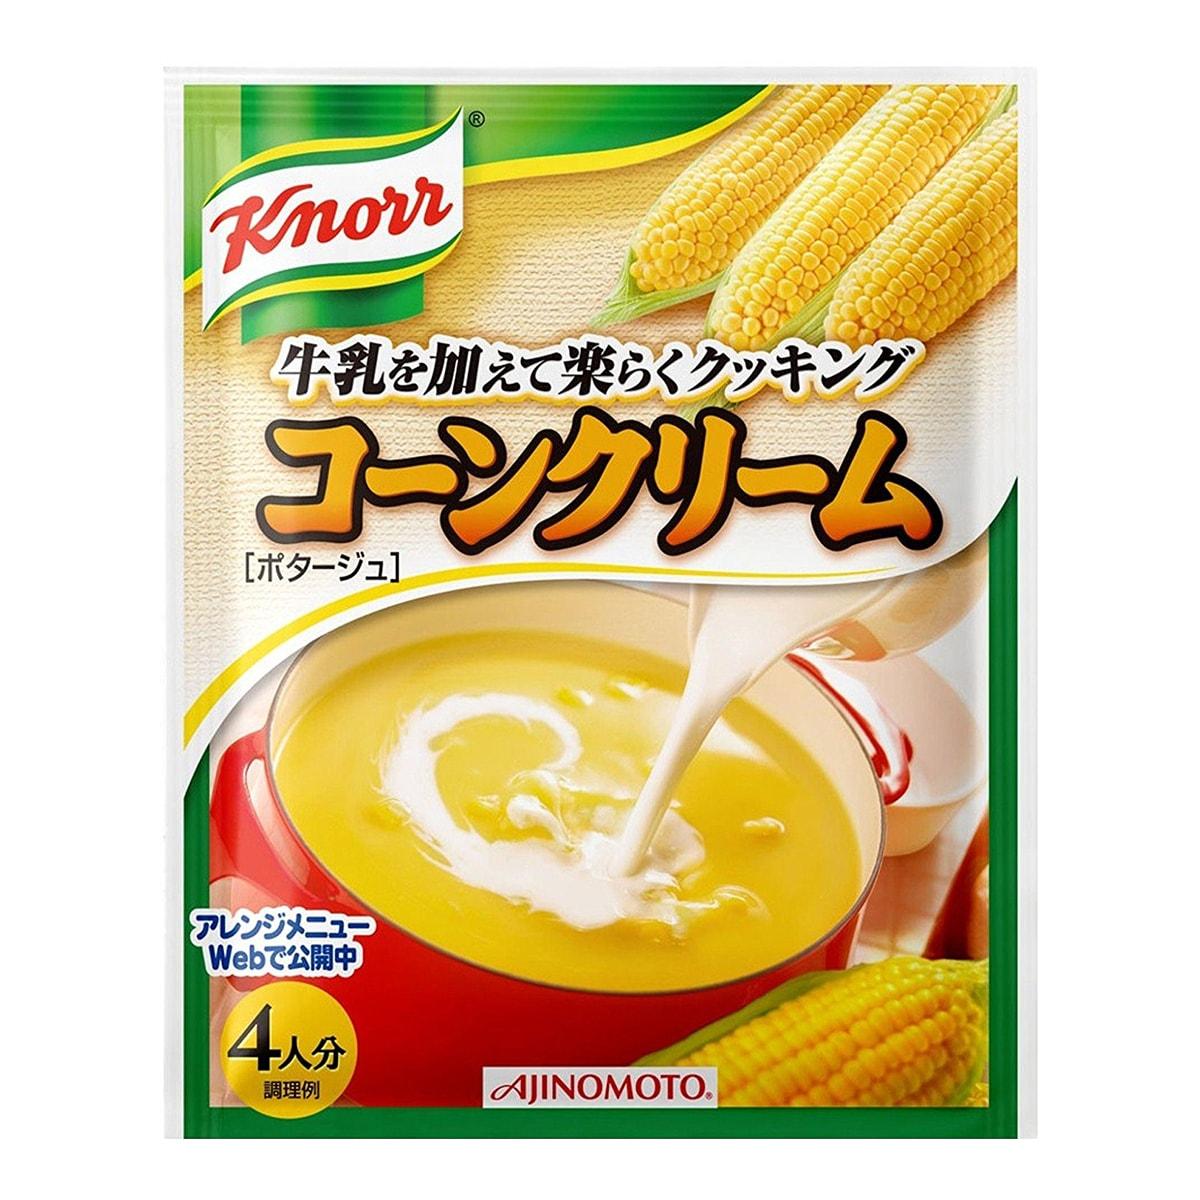 KNORR Corn Cream Potage Soup 65.2g